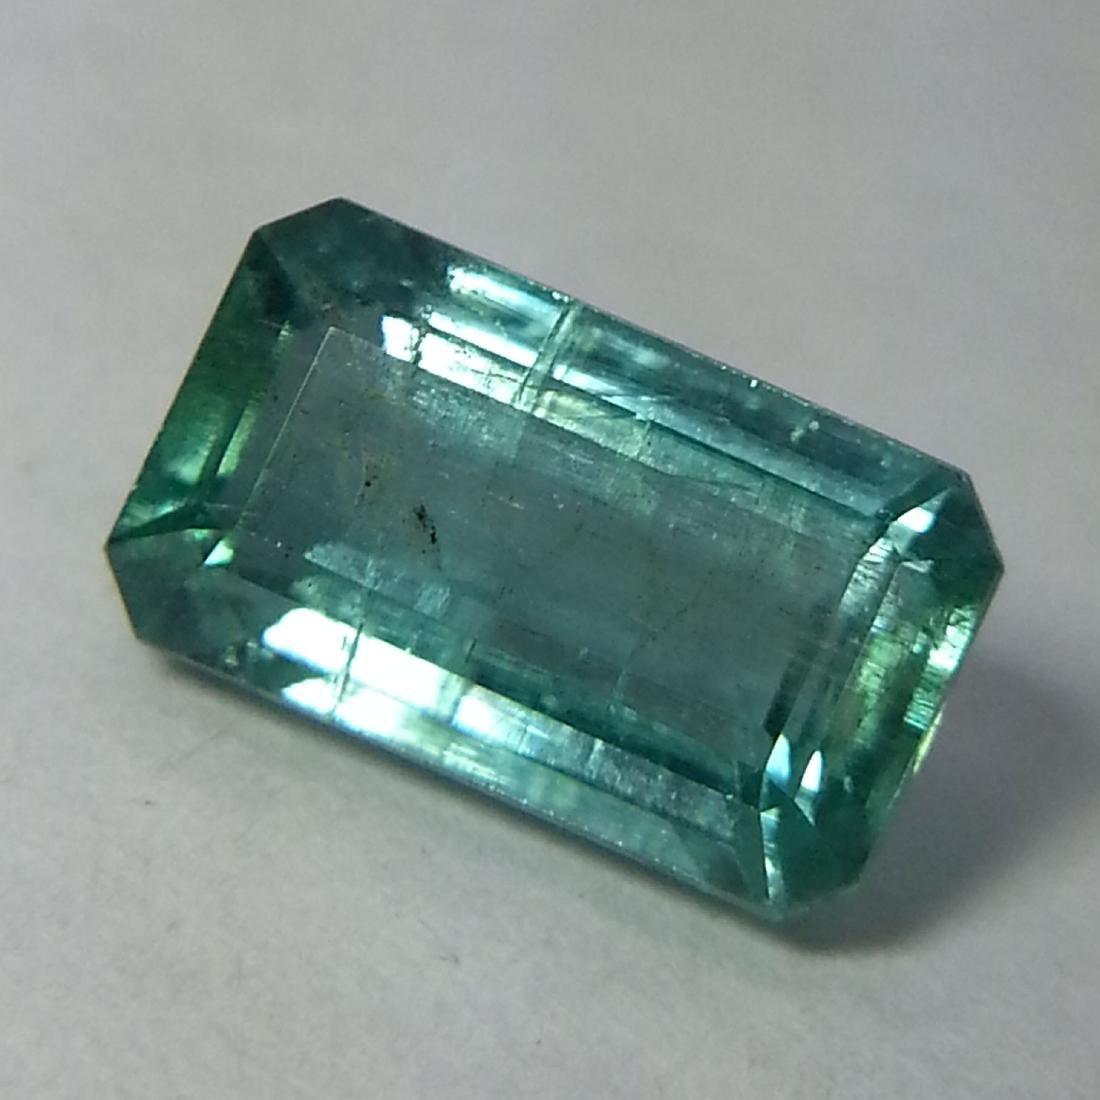 Emerald - 2.23 ct - 2